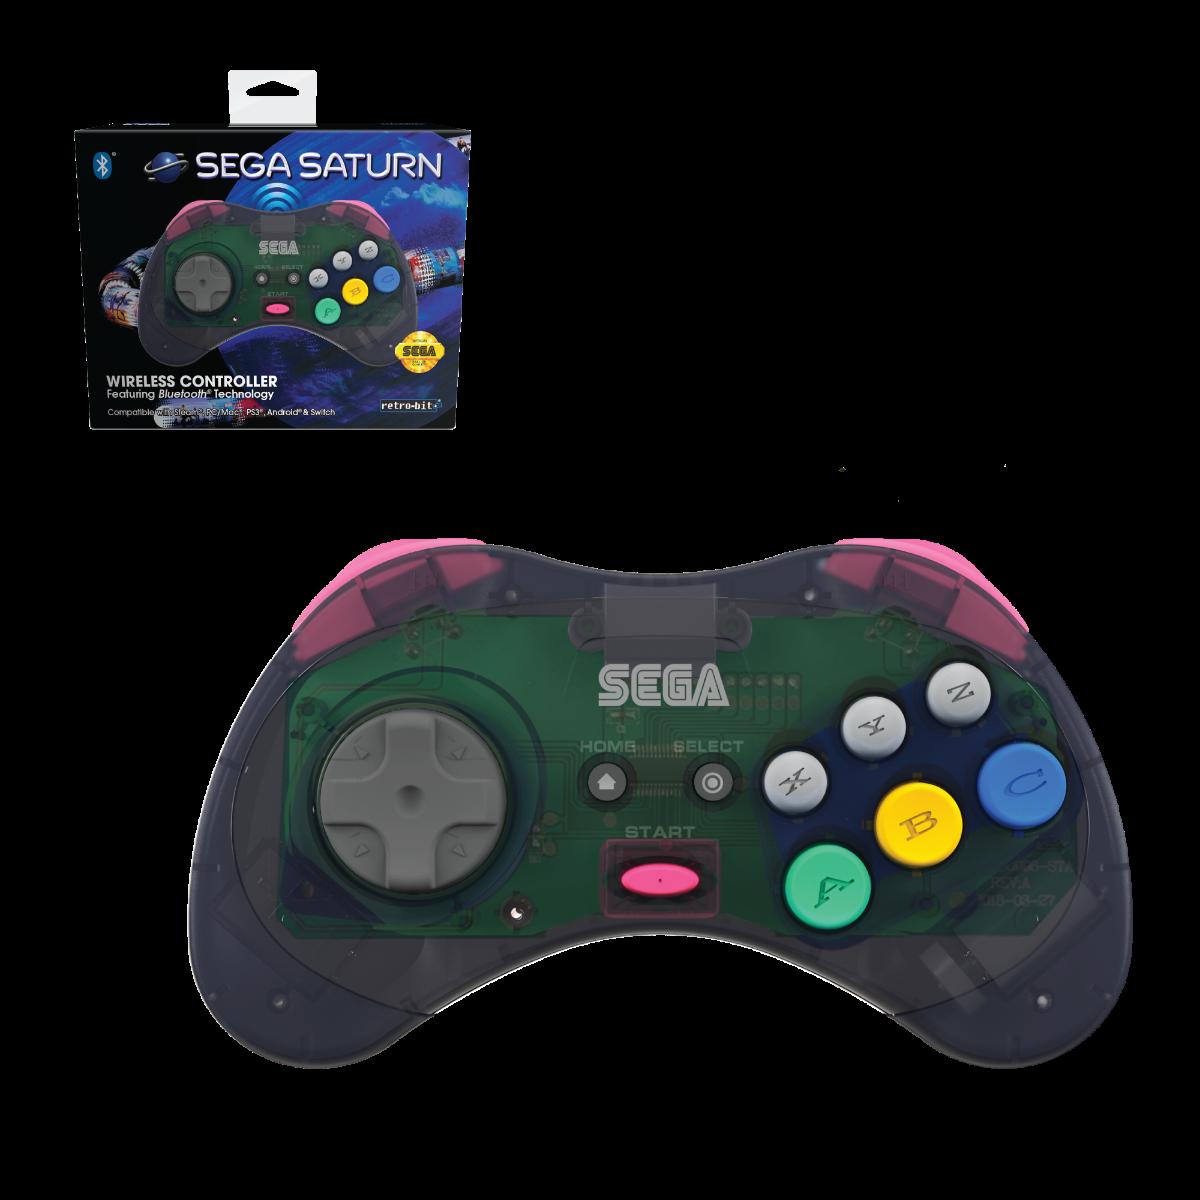 SEGA, Saturn, wireless, 8-button, arcade pad, bluetooth, PC, Mac, Android, Switch, Slate Grey